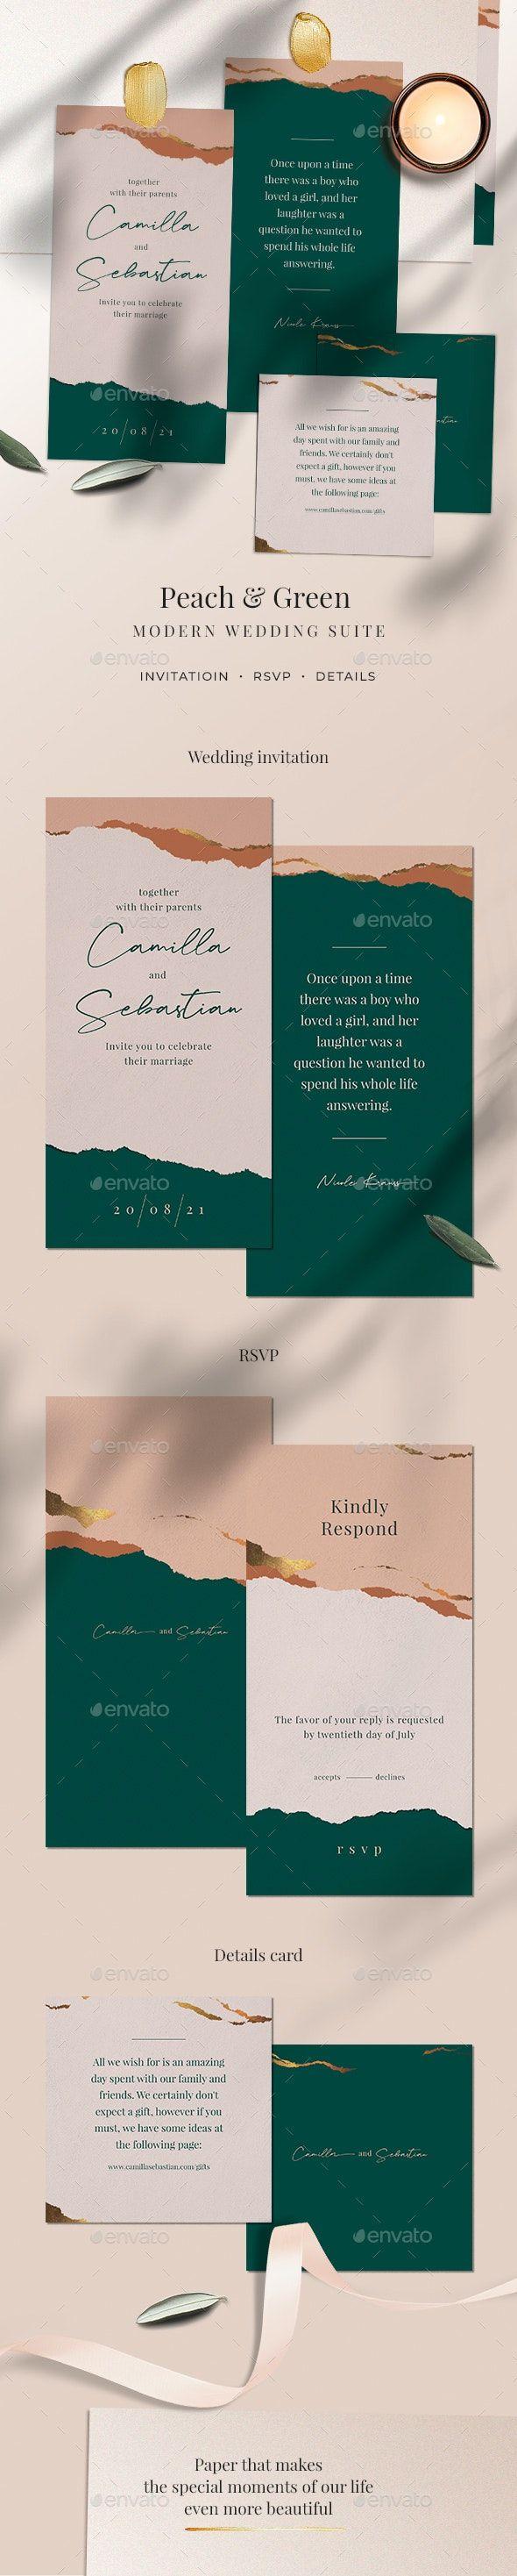 Green Wedding Invitation #AD #Green, #ad, #Wedding, #Invitation